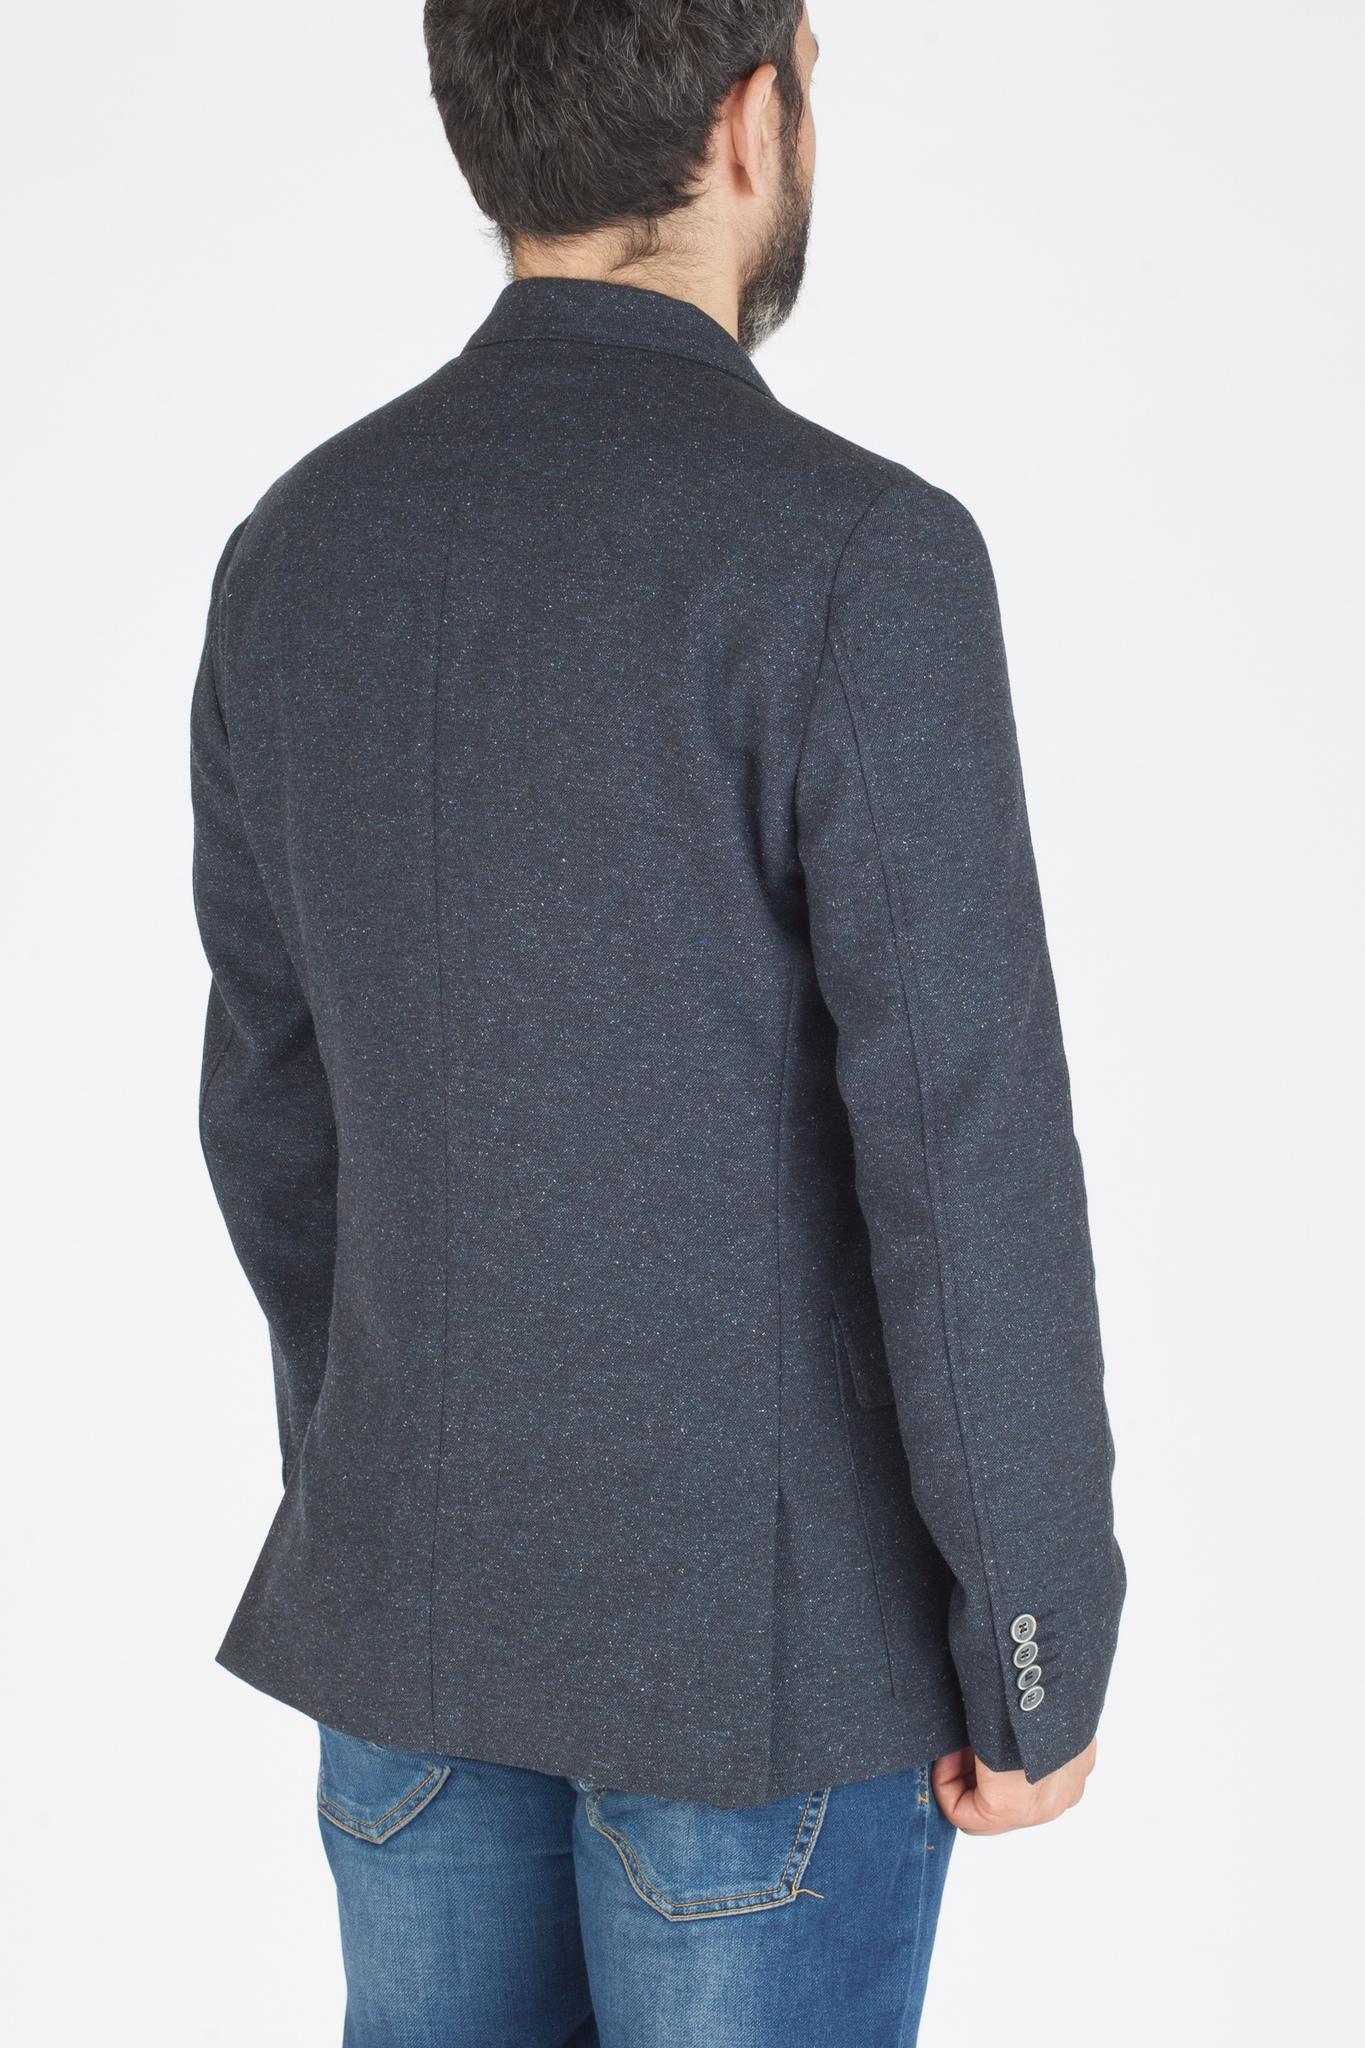 Тёмно-синий пиджак из шерсти, хлопка, шёлка и синтетики